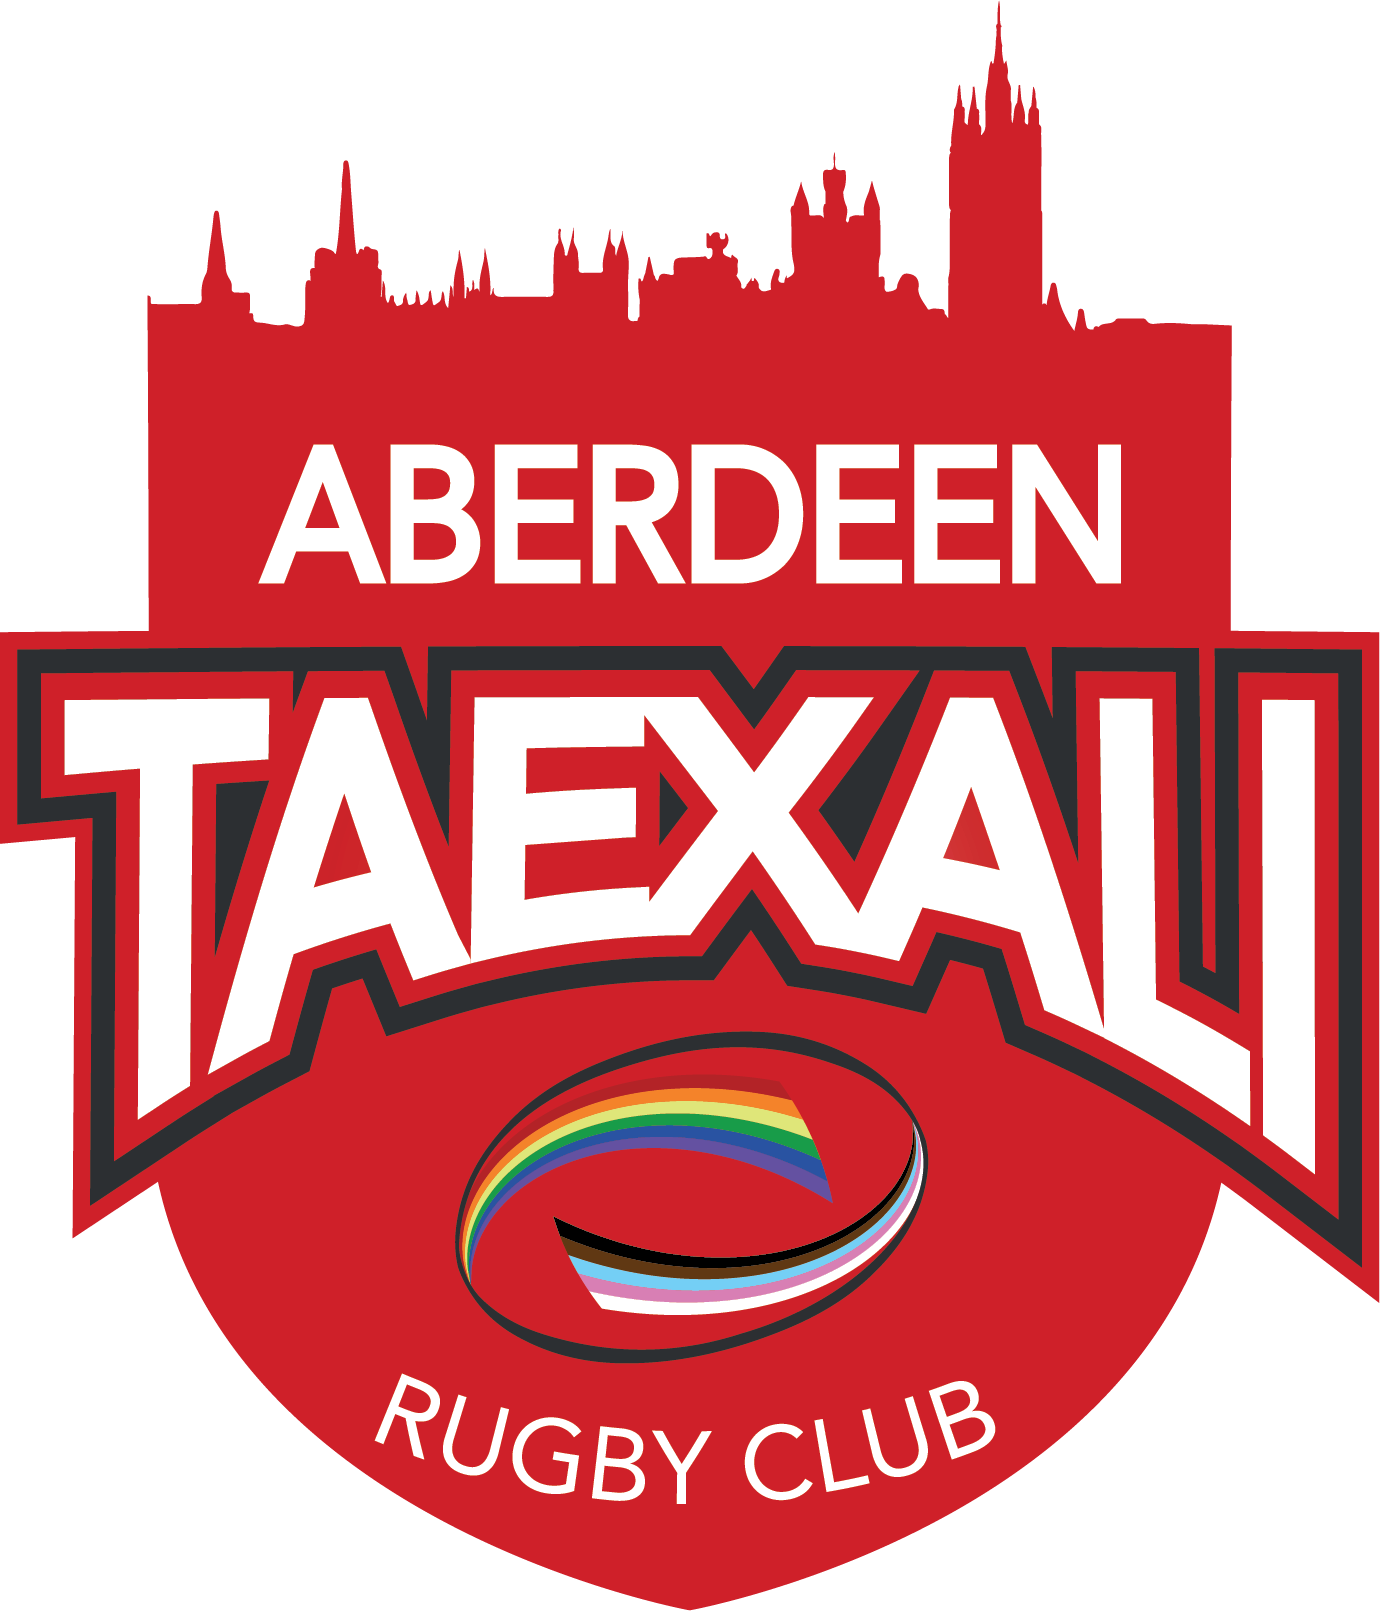 Aberdeen Taexali Rugby Club